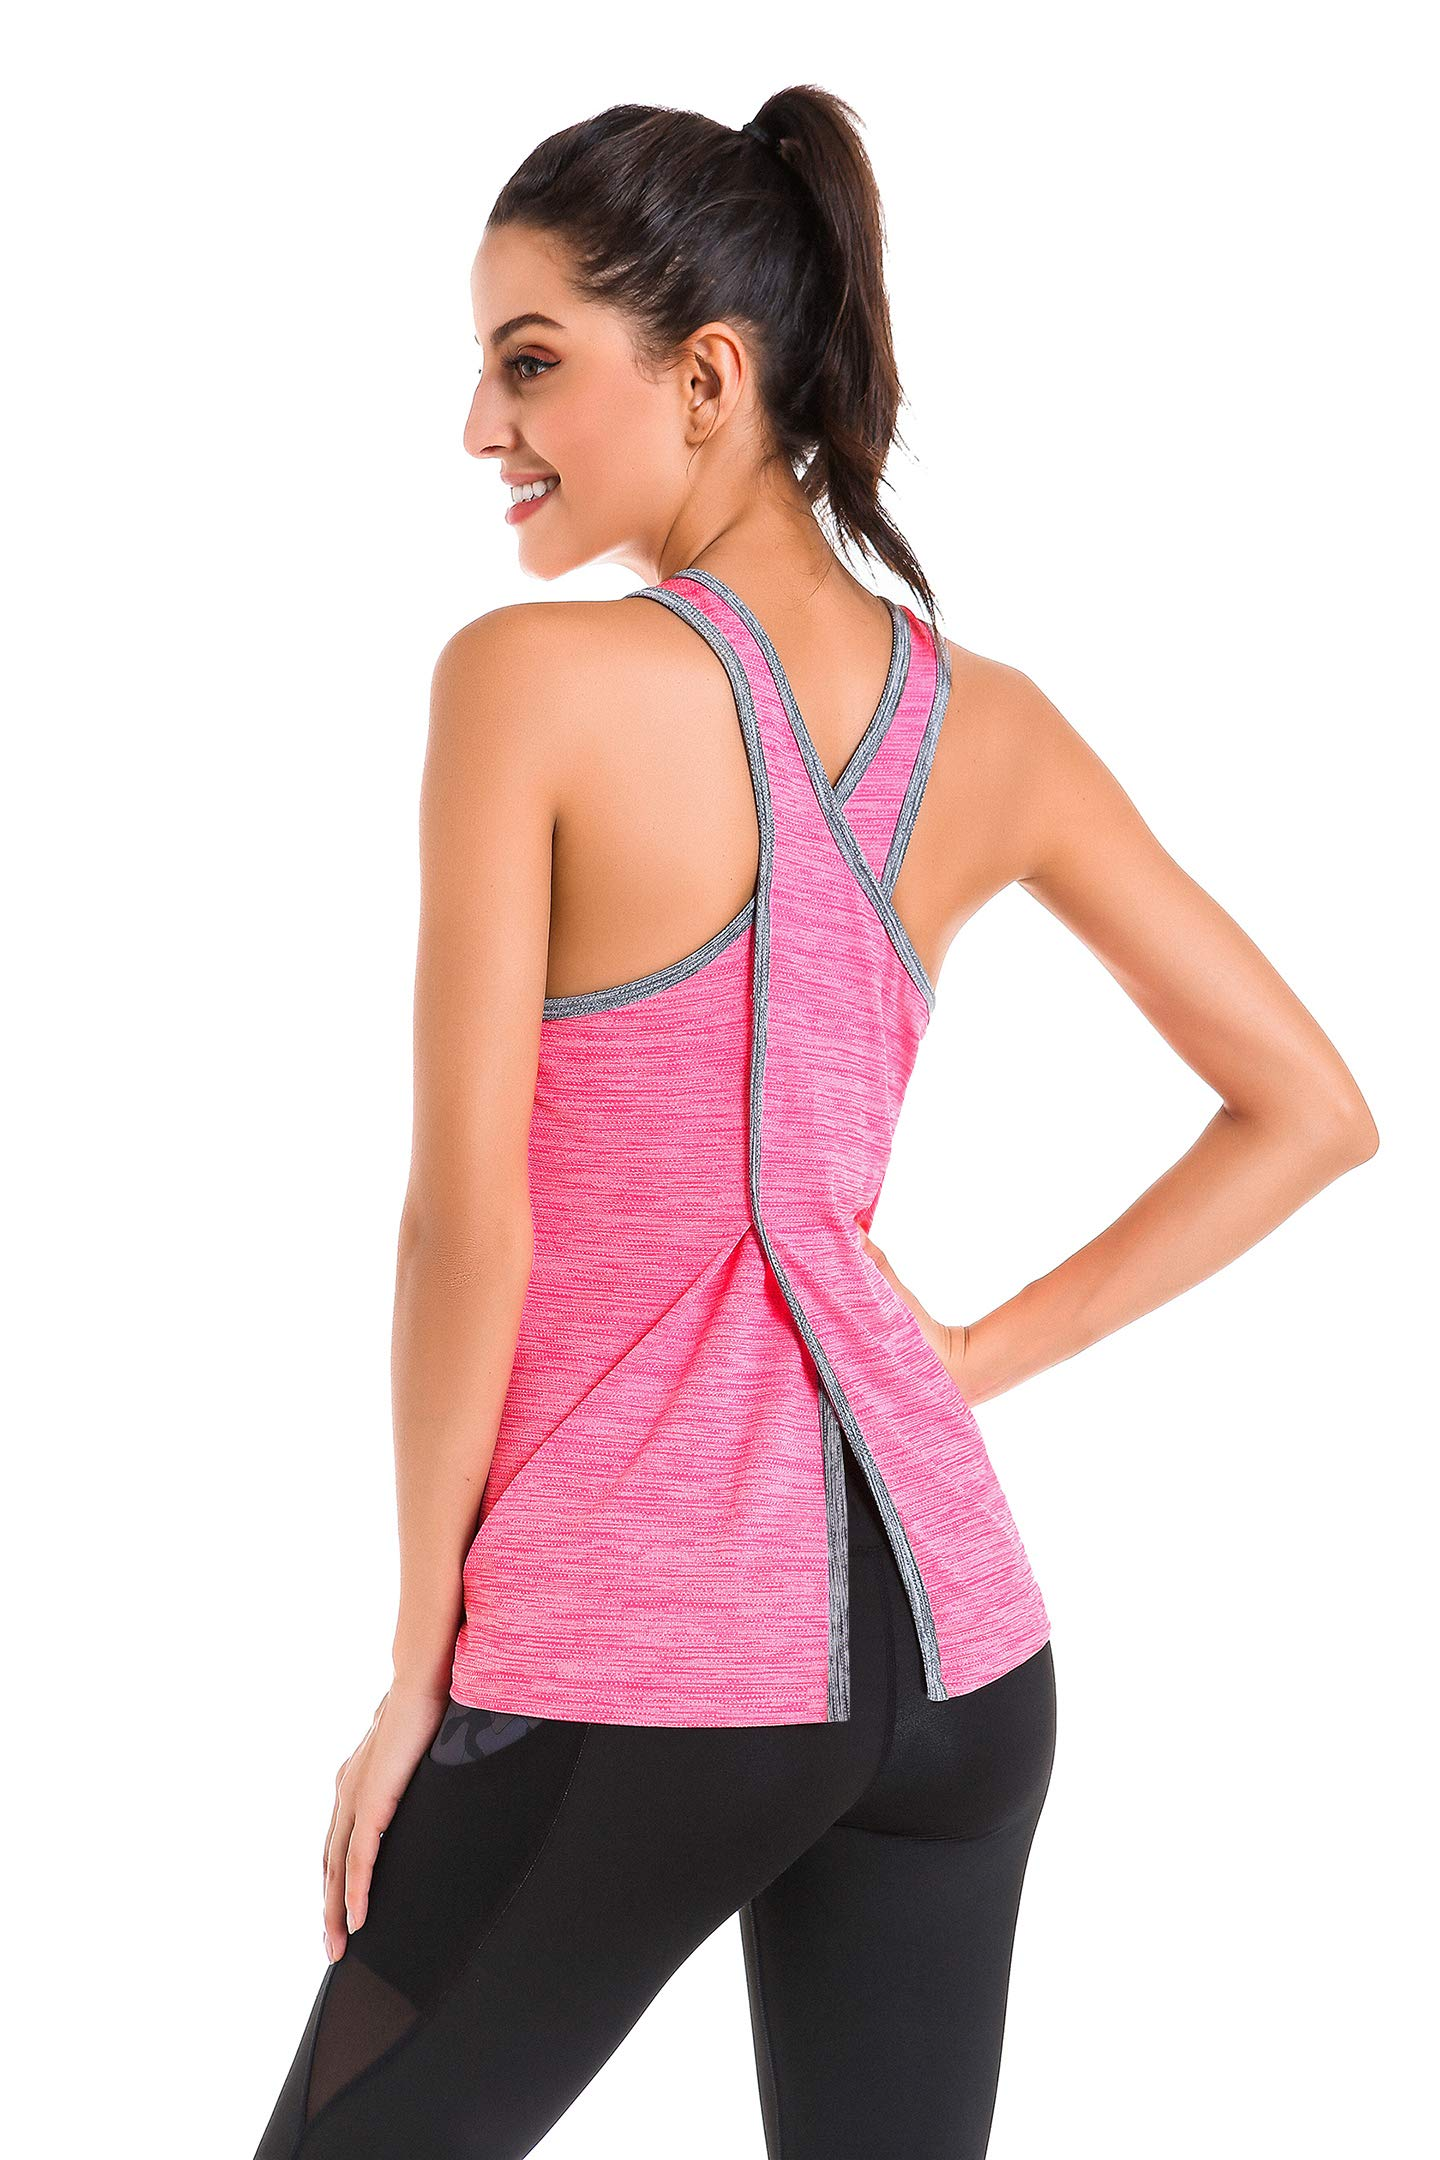 Fresca Womens Open Back Yoga Shirts Racerback Workout Tank Tops Pink Medium